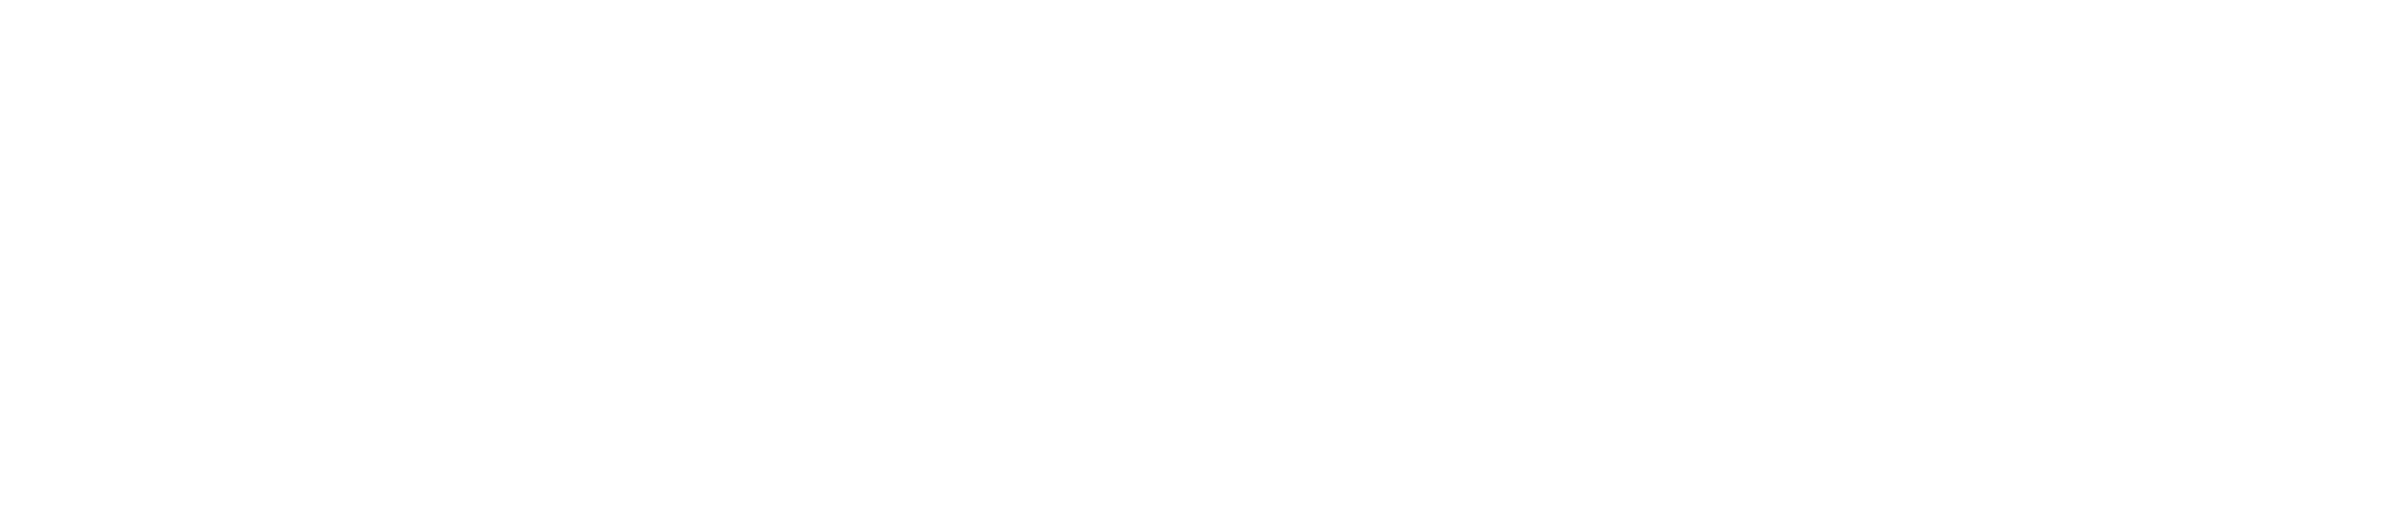 Revlon-logo-png-transparent -